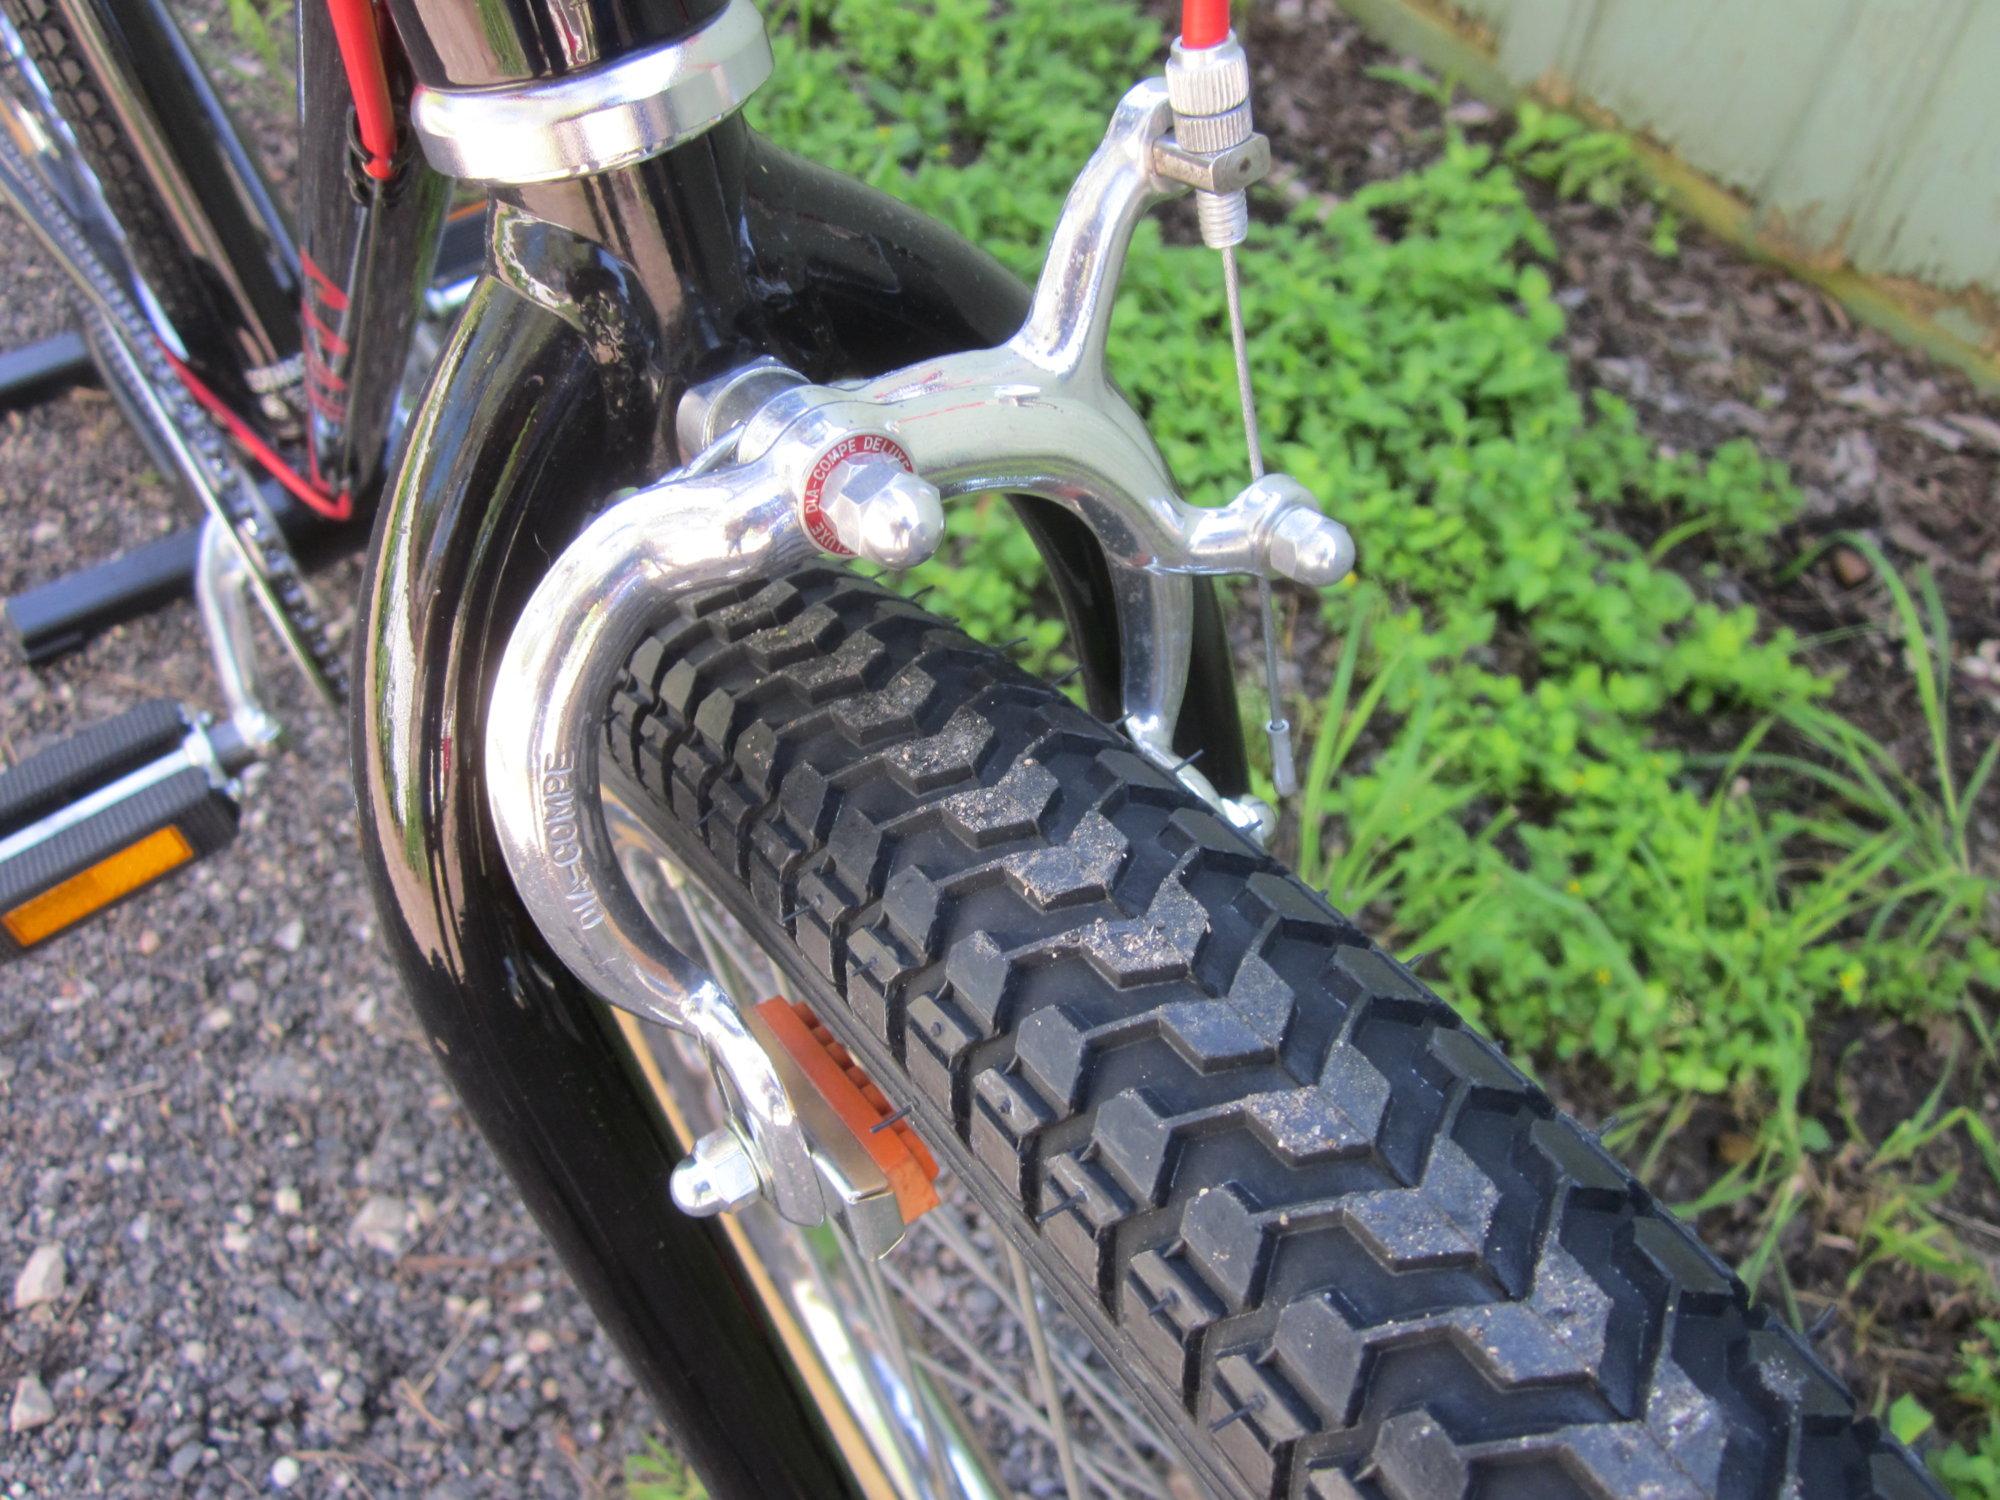 Ross Bike 012.JPG